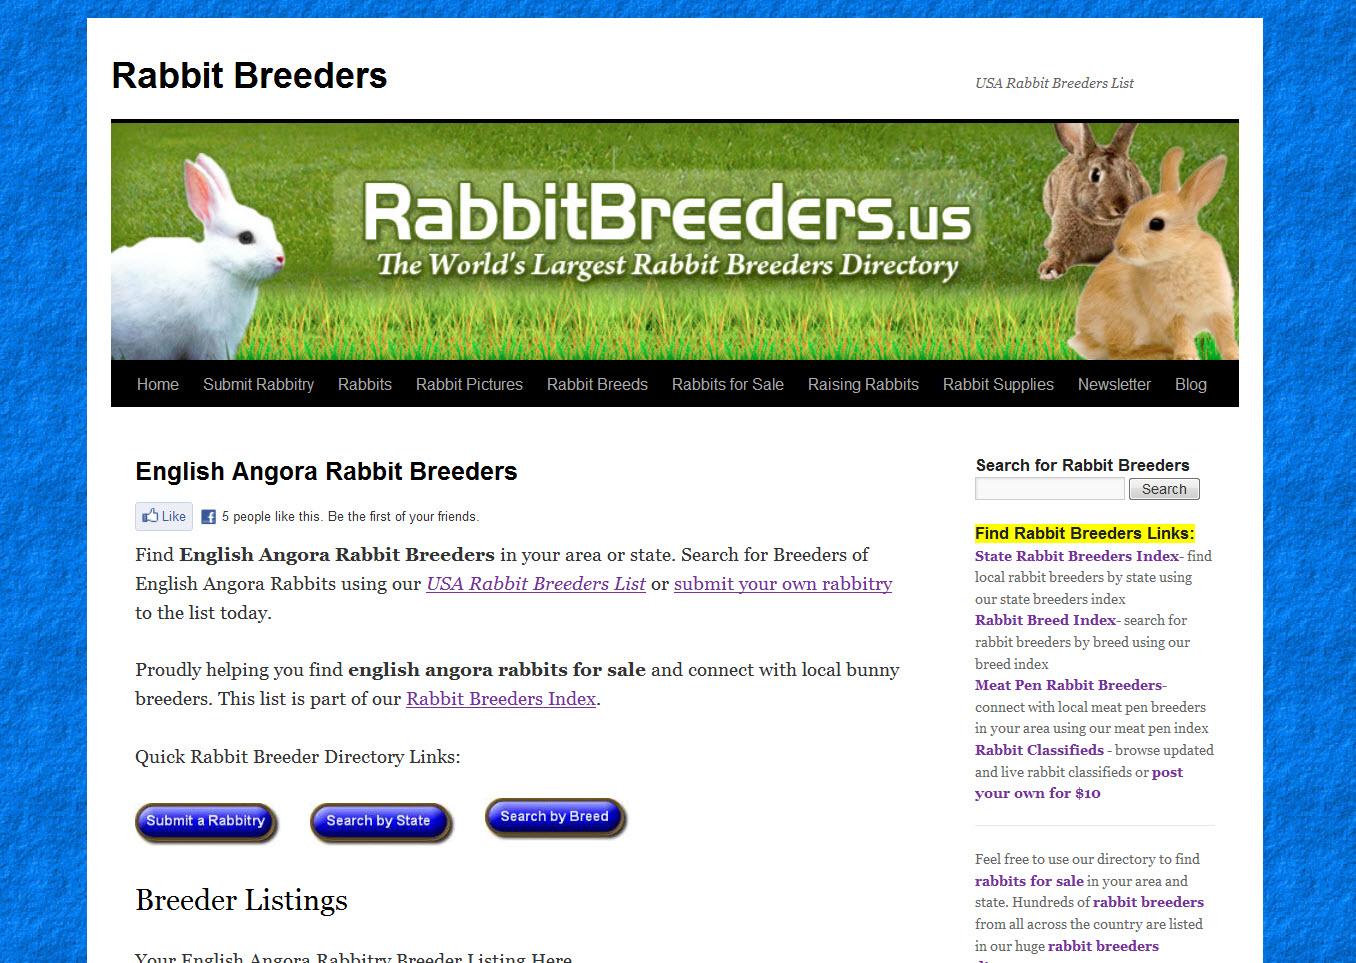 English Angora Rabbit Breeders